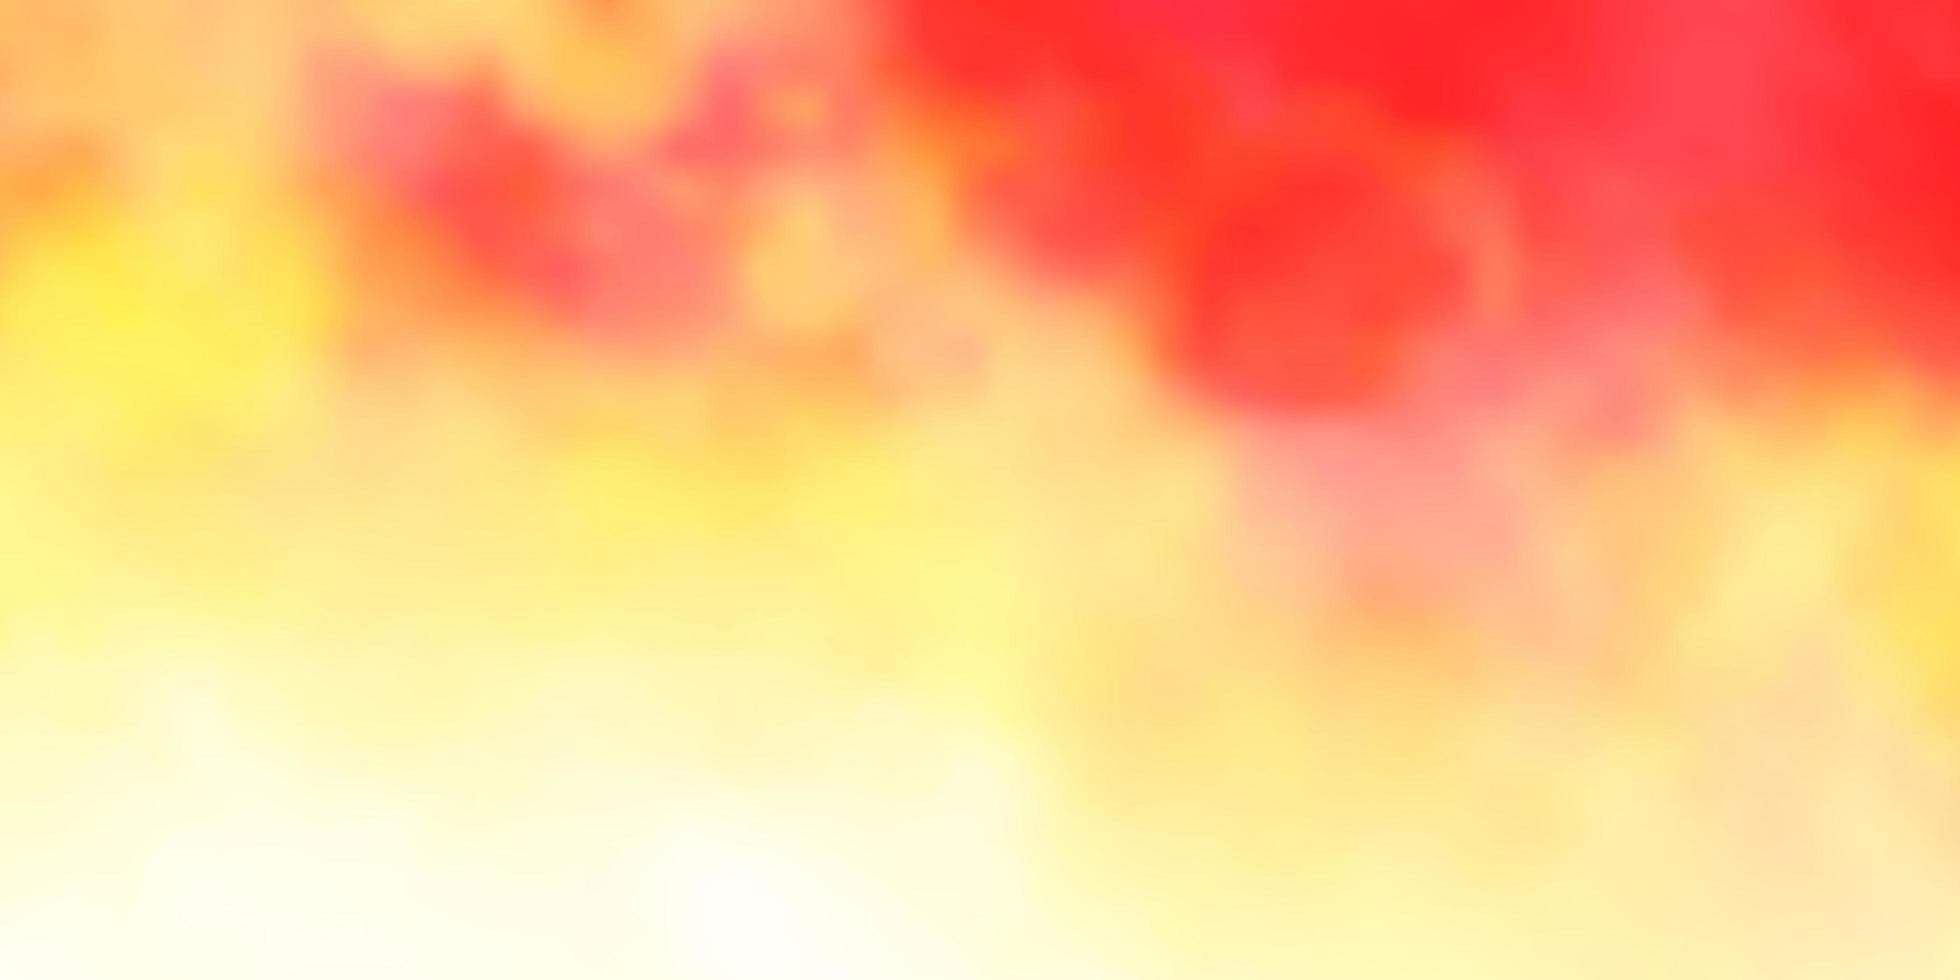 ljus orange vektor bakgrund med cumulus.